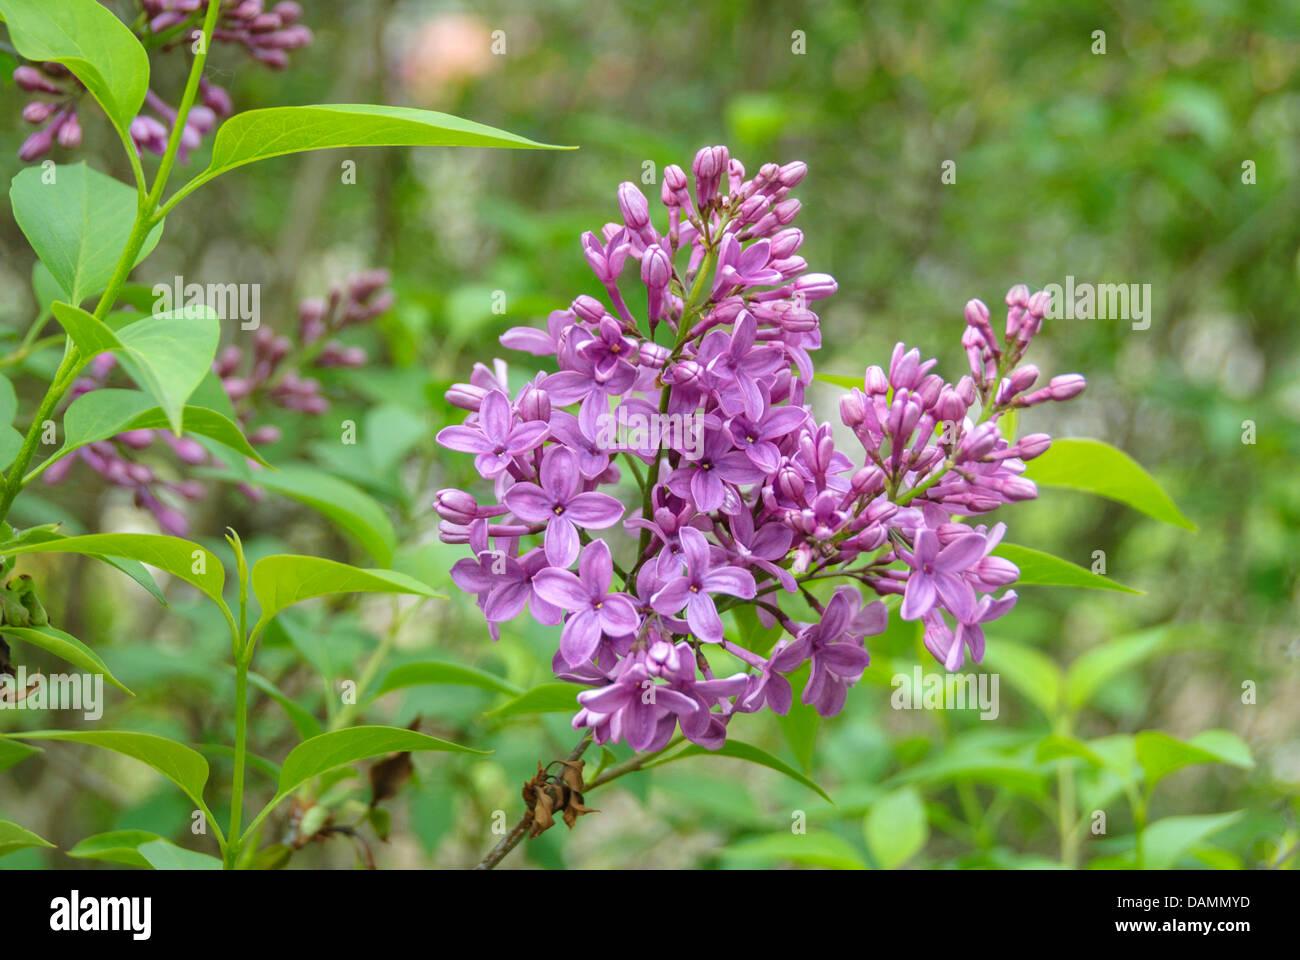 Chinese lilac (Syringa chinensis 'Saugeana', Syringa chinensis Saugeana), cultivar Saugeana - Stock Image